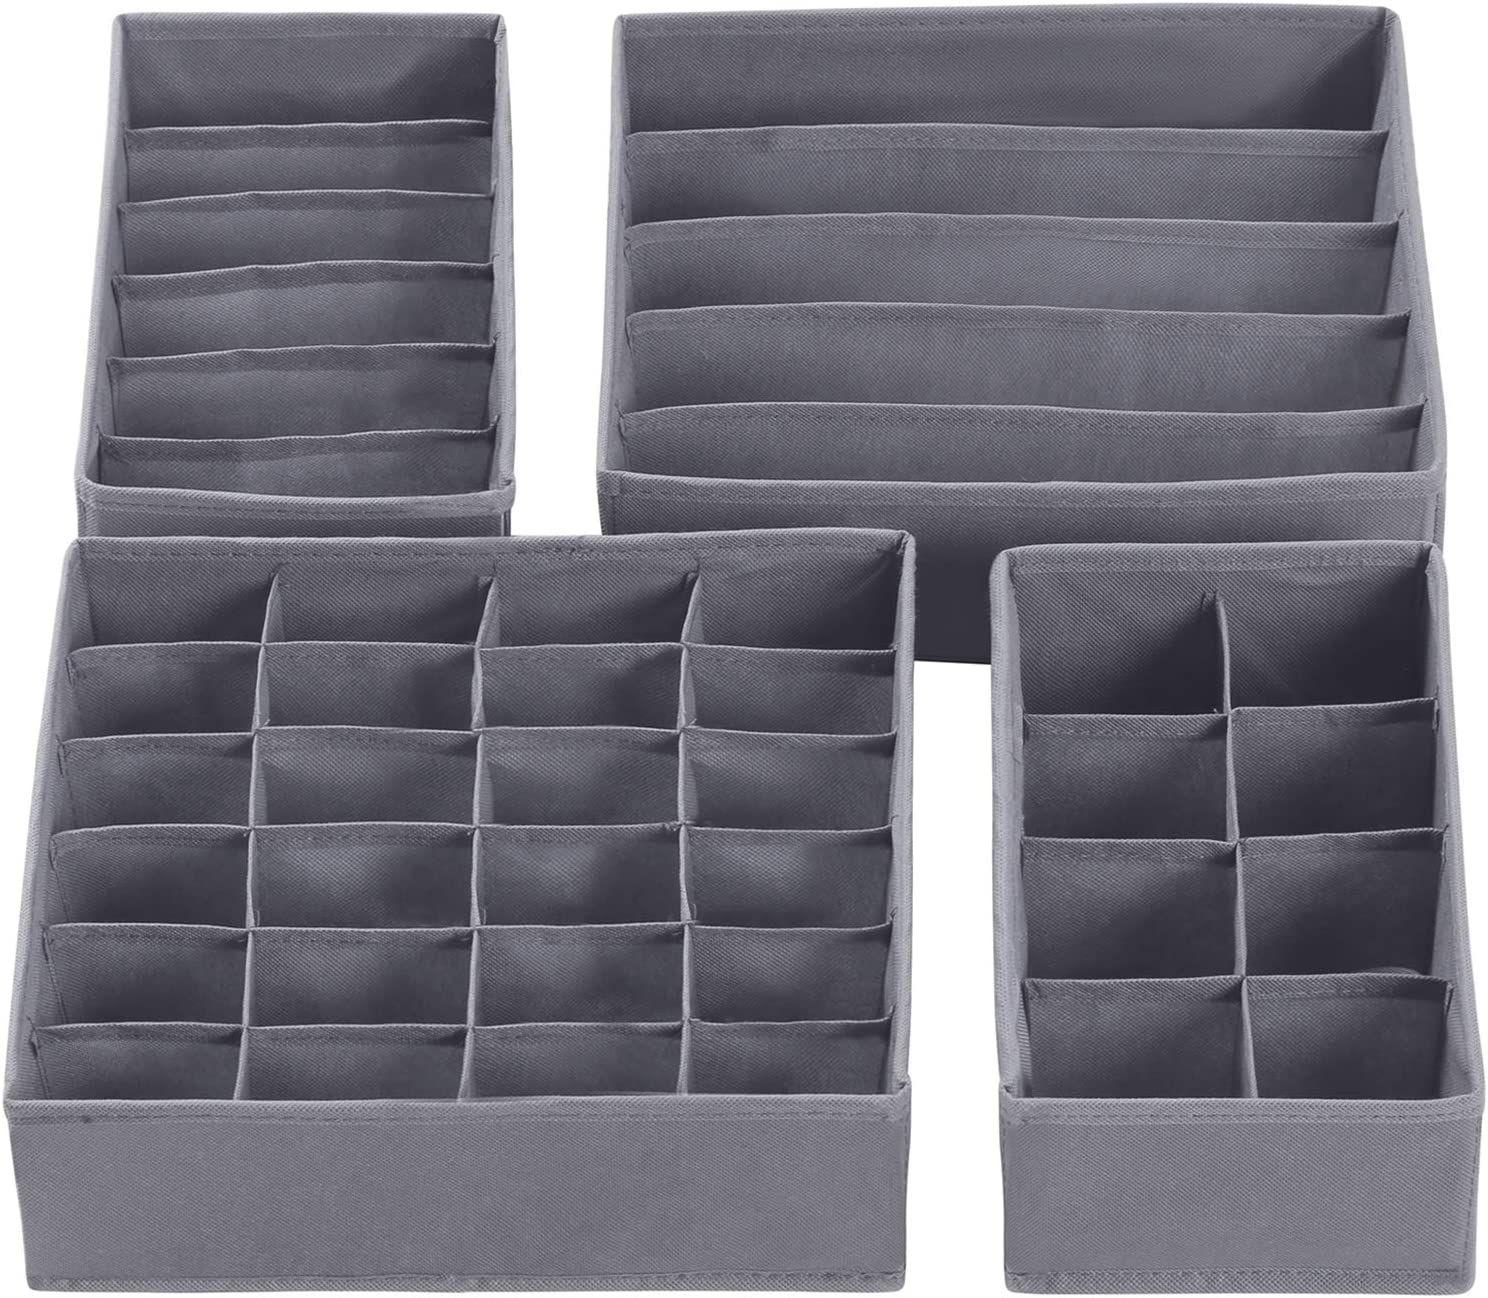 Organizador de Armario para Ropa Interior Set de 4 Piezas Gris Oscuro RUS04GY Bufandas Corbatas SONGMICS Organizador para Cajones con Compartimentos Caja de Almacenaje Plegable Calcetines